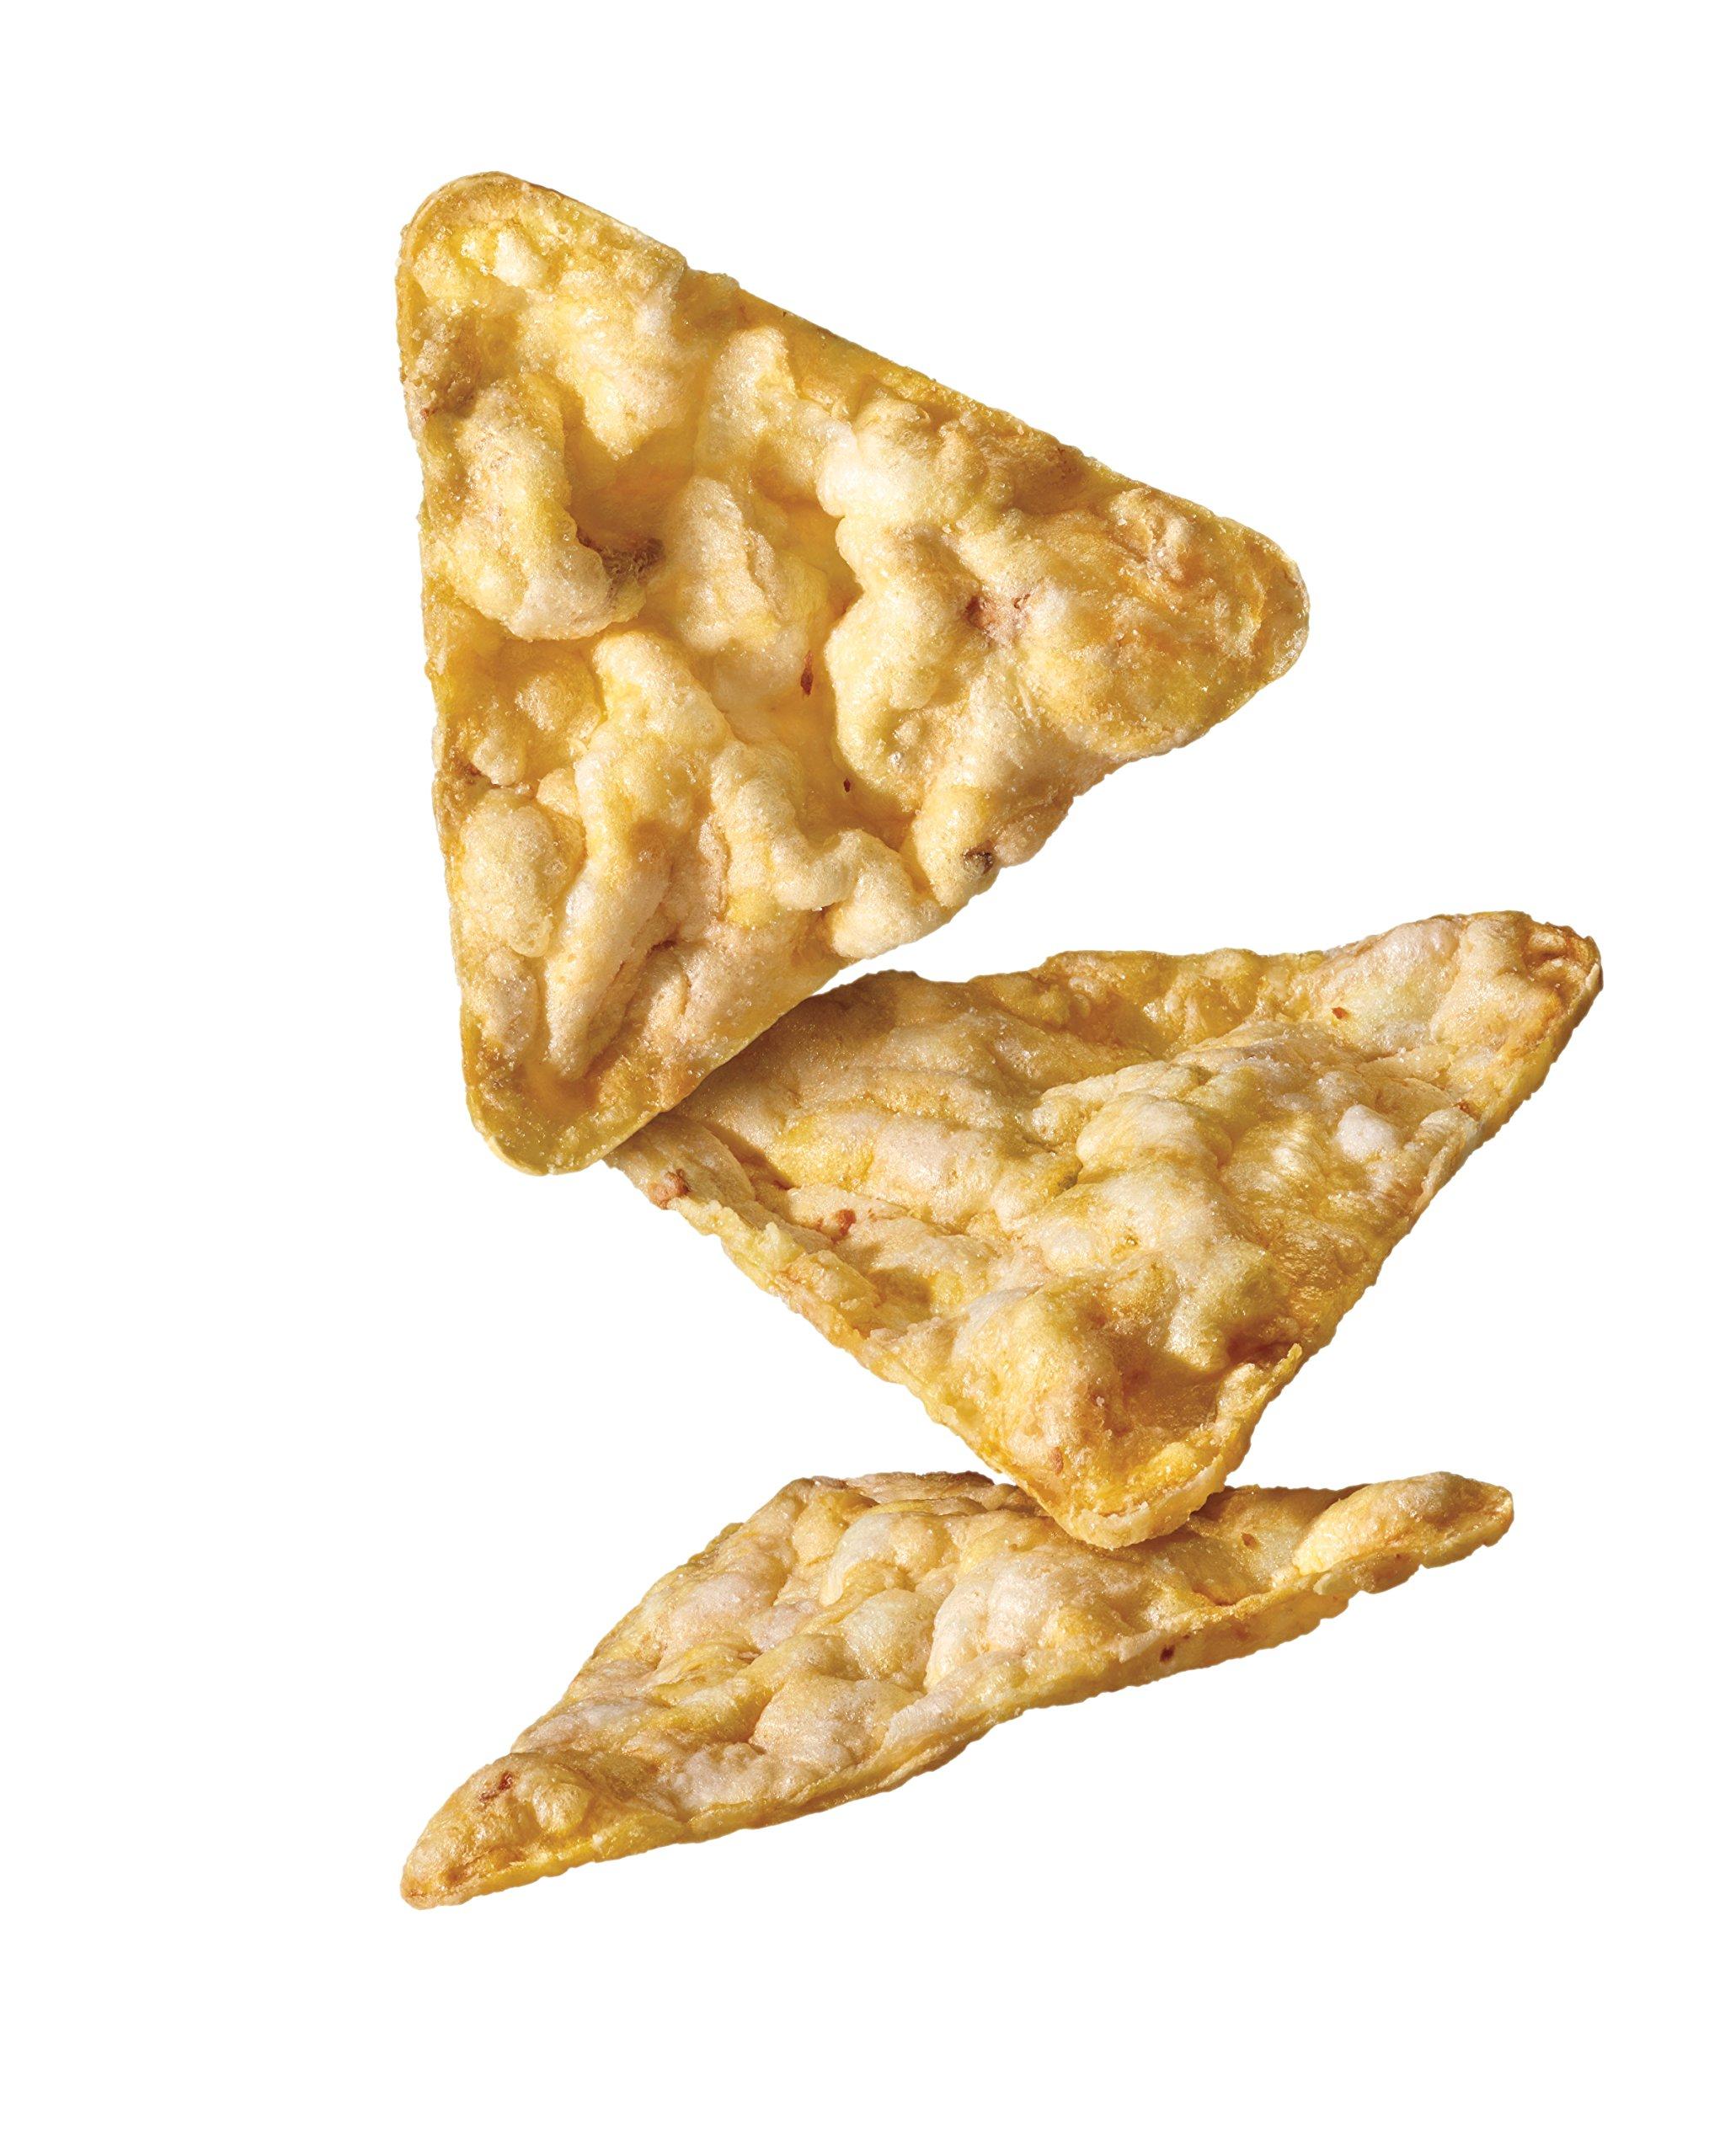 PopCorners Sea Salt Snack Pack   Gluten Free, Vegan Snack   (40 Pack, 1 oz Snack Bags) by Popcorners (Image #5)